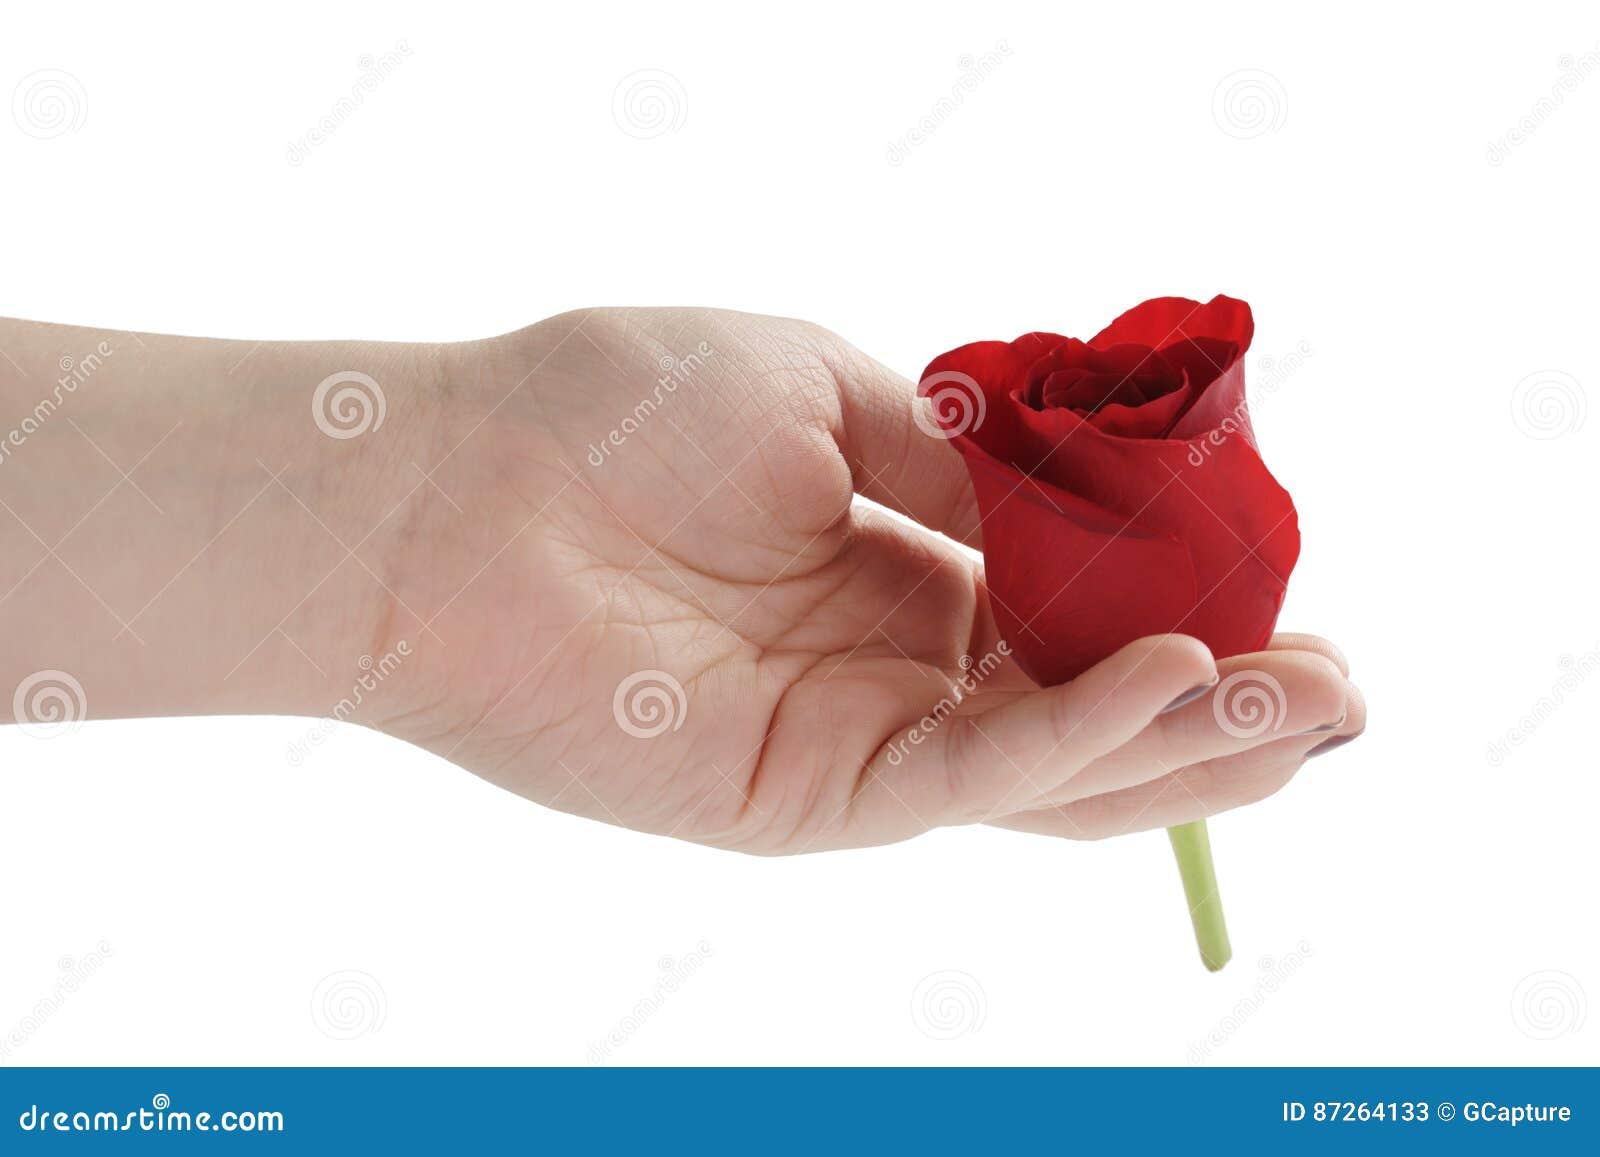 Thumbs rose teen